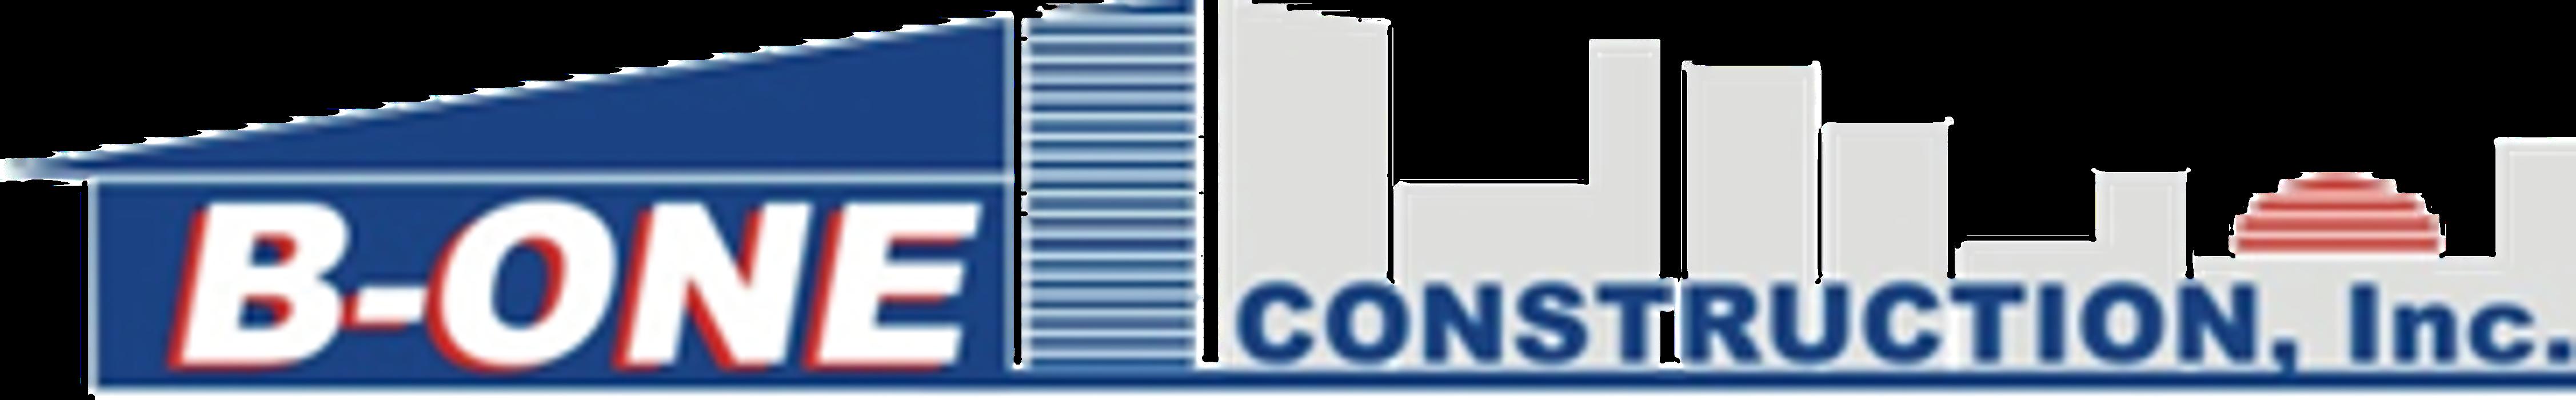 B-One Construction - Burbank, CA